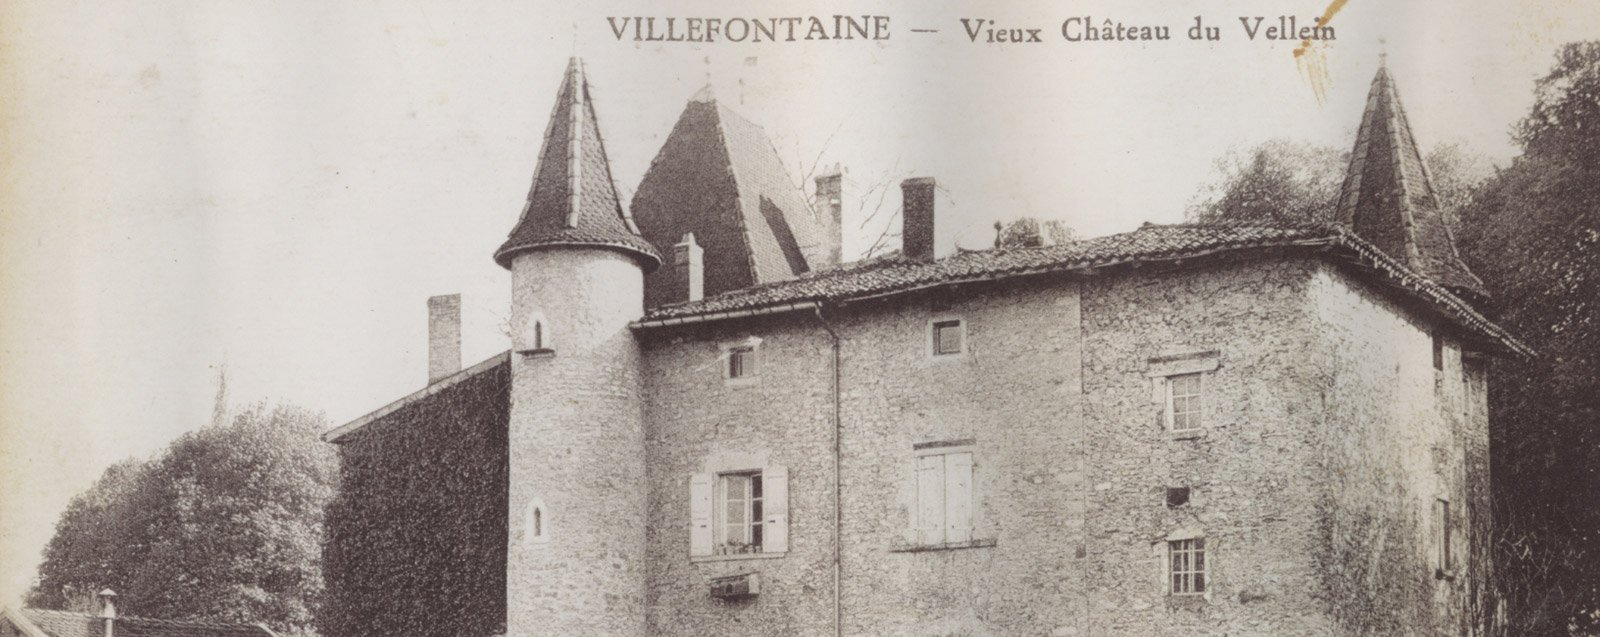 Chateau du Vellein, Villefontaine